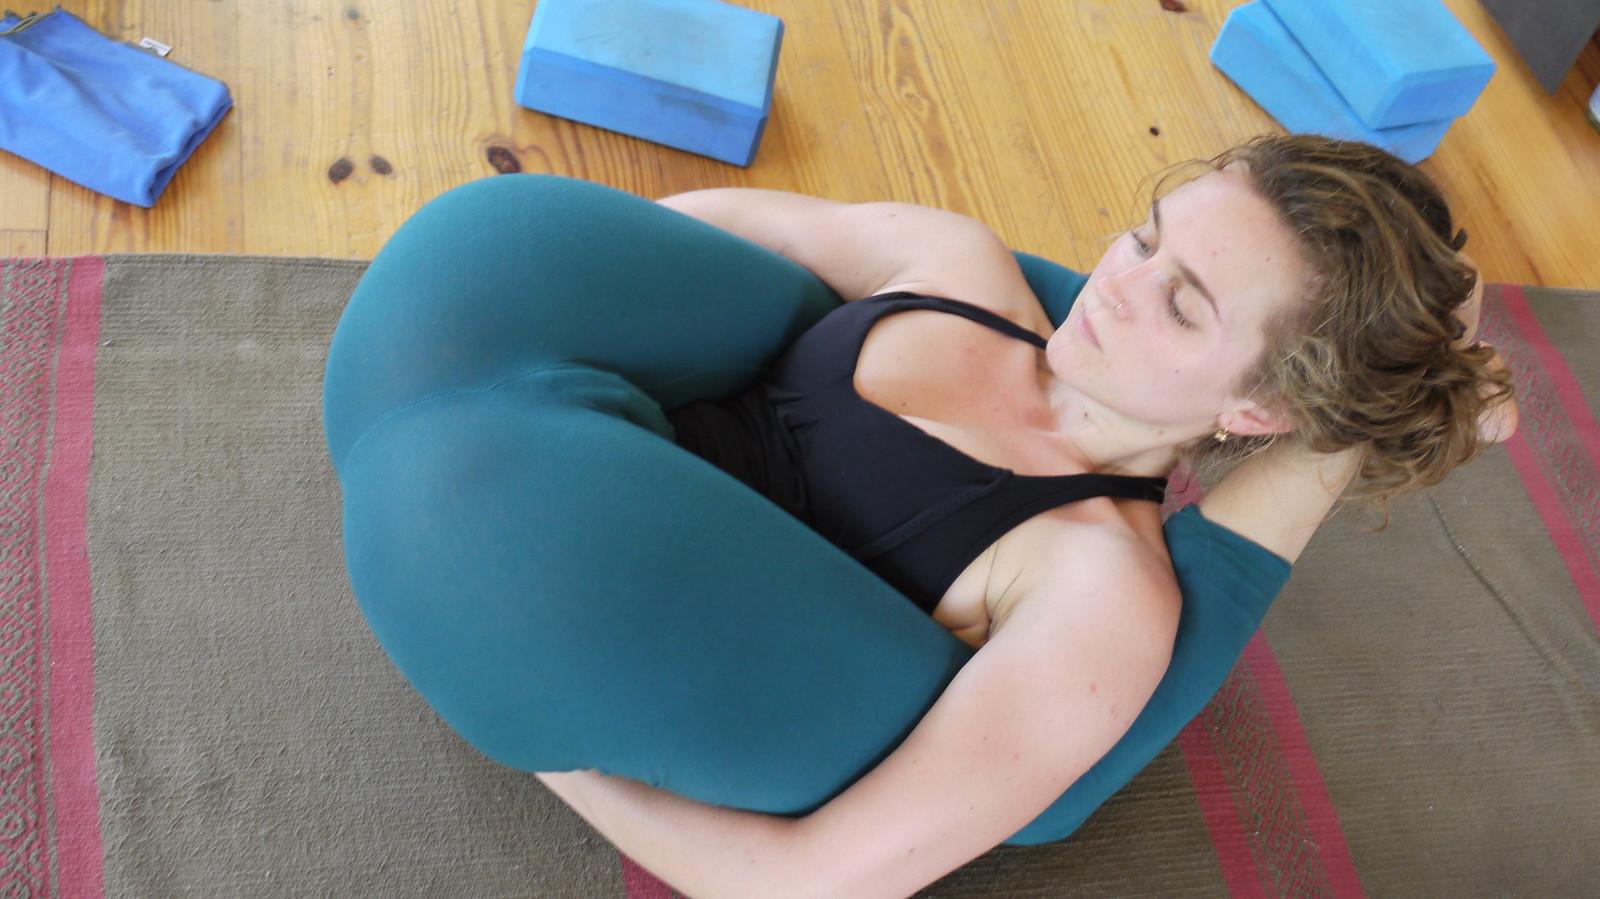 Pants hot through see yoga girls